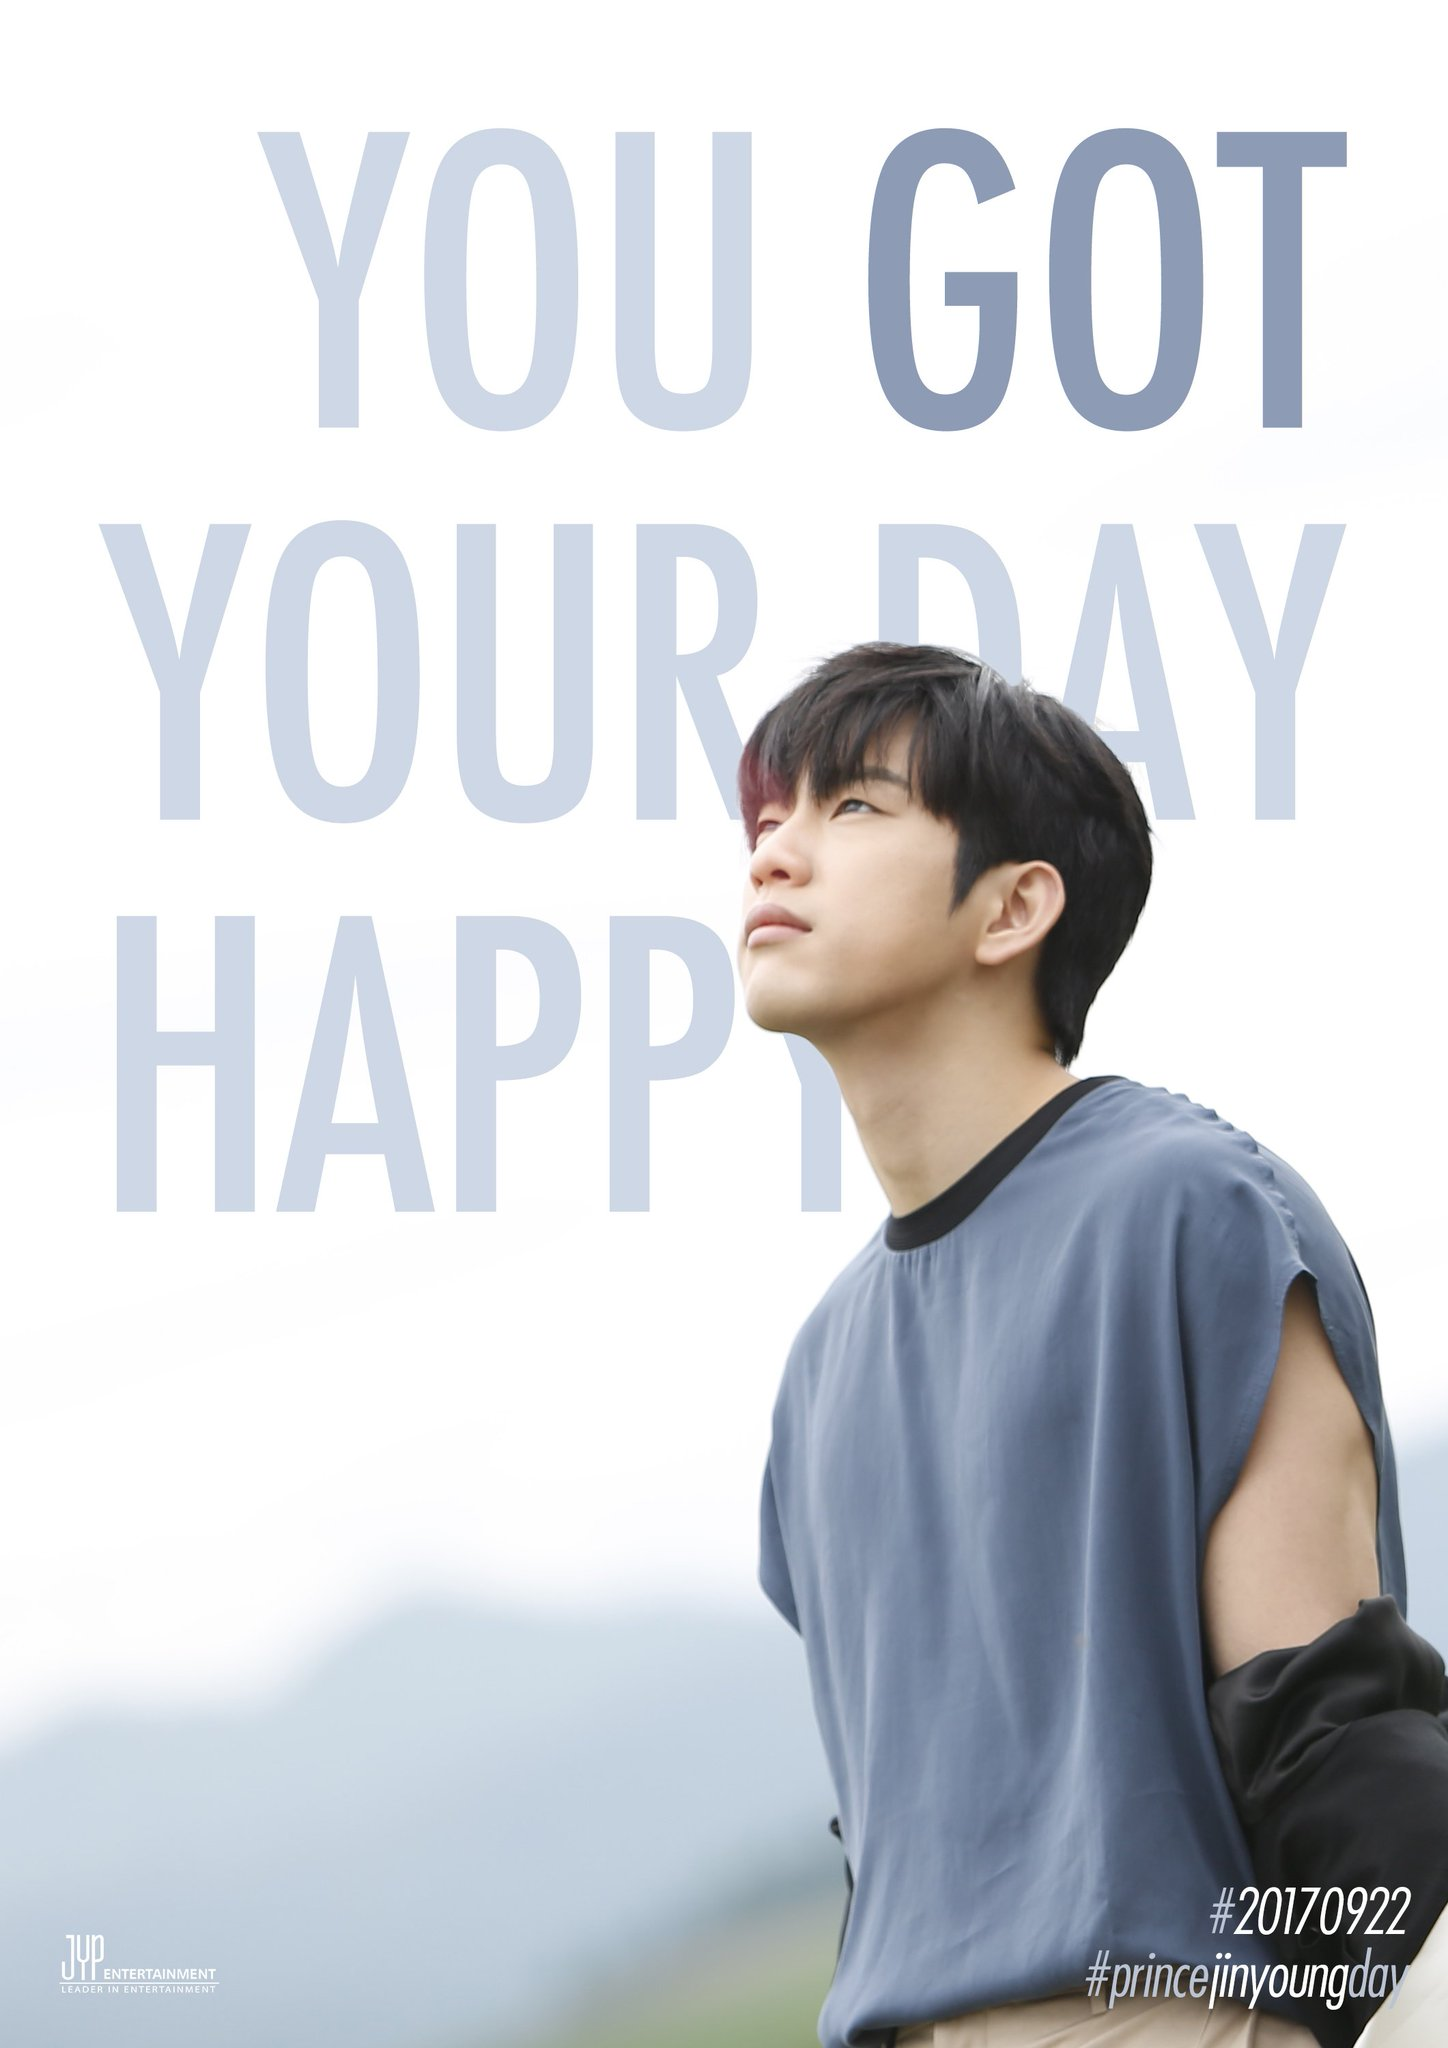 HAPPY BIRTHDAY Jinyoung #PrinceJinyoungDay https://t.co/jrG5HX5PAt